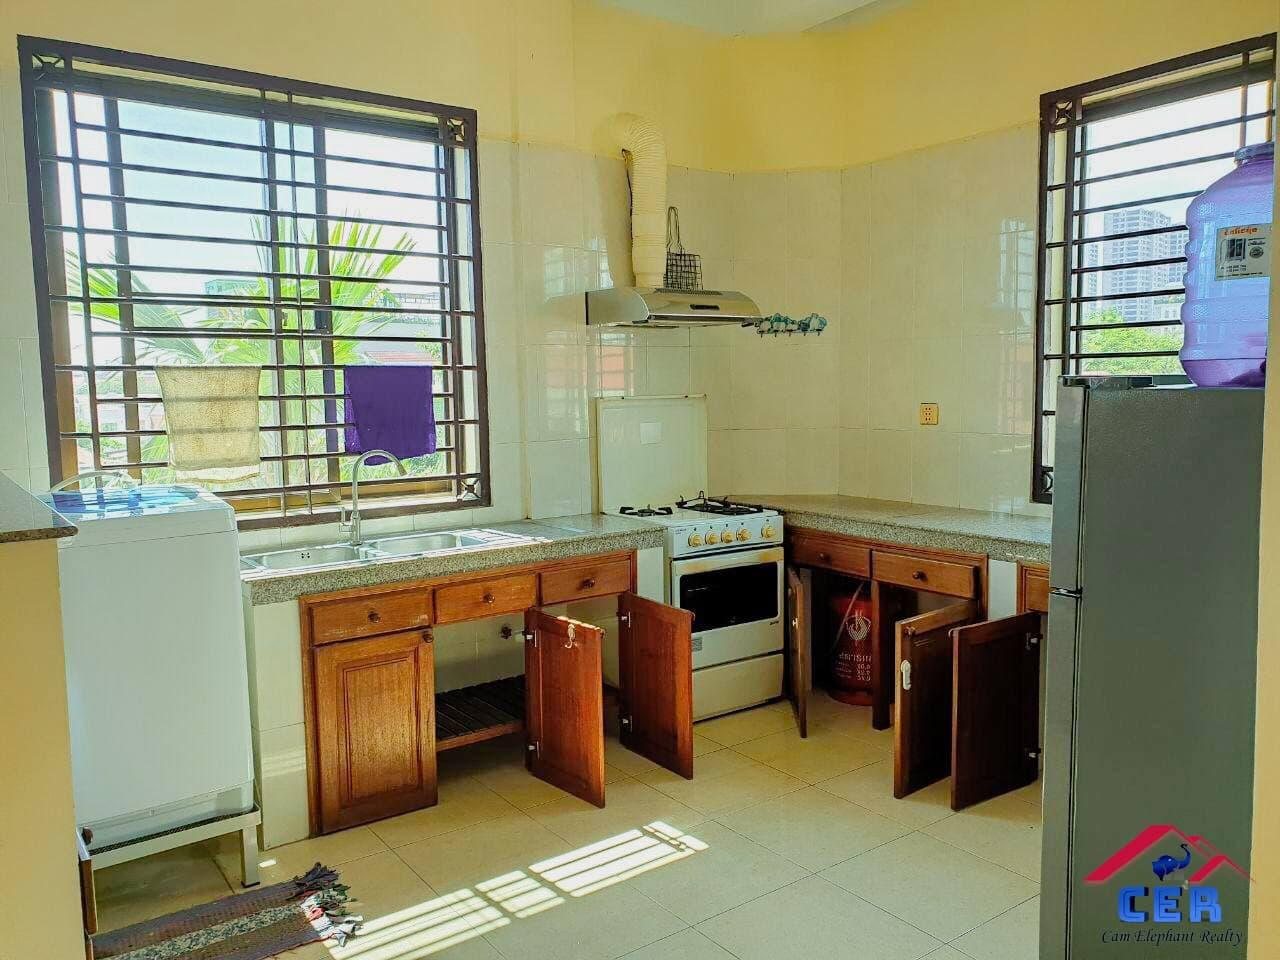 Apartment for Rent (2 Bedroom; BKK1 area)